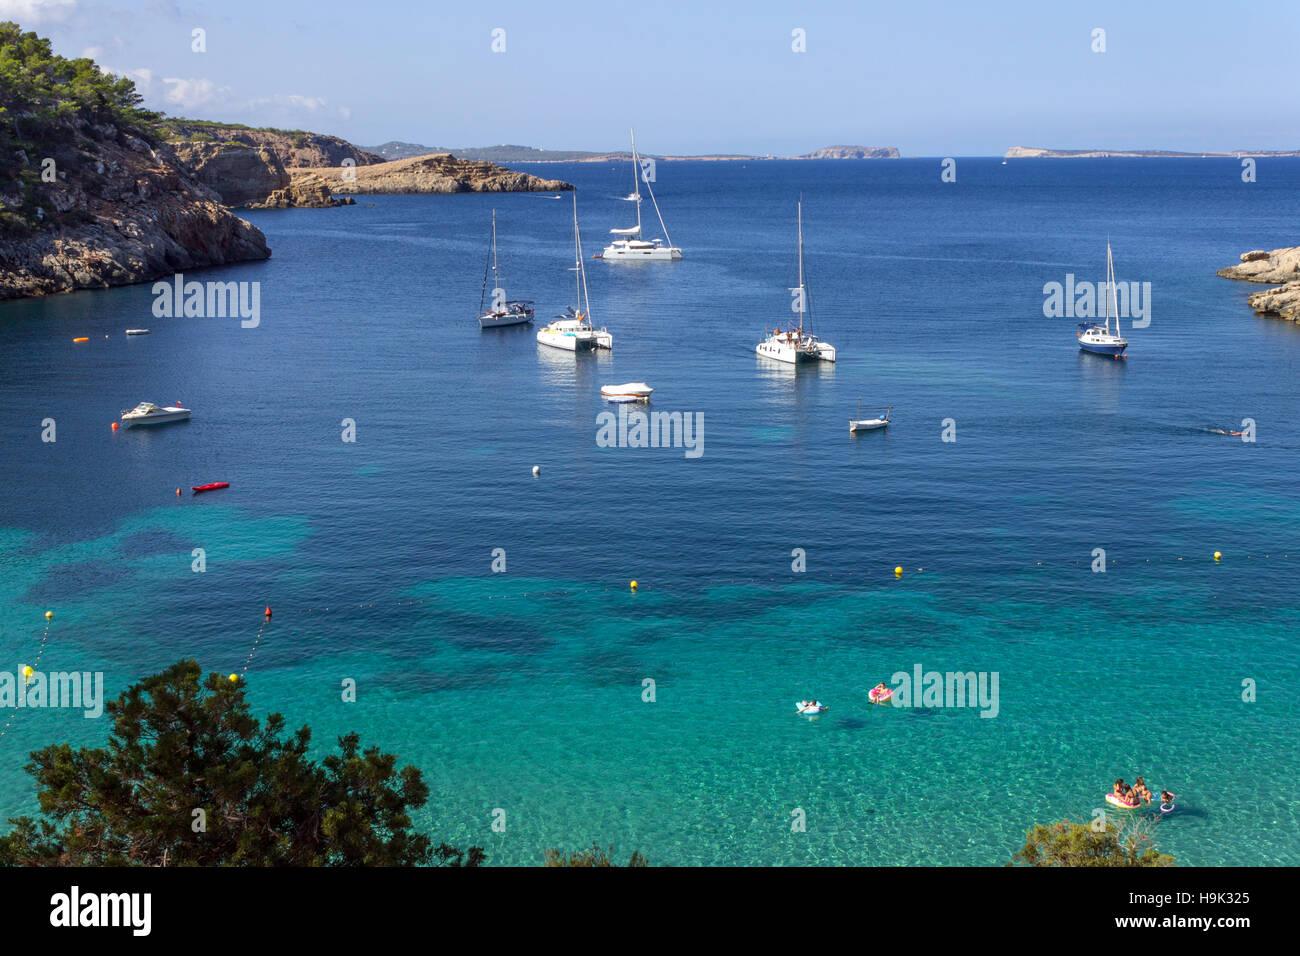 Spain, Balearic Island, Ibiza, Cala Salada beach - Stock Image